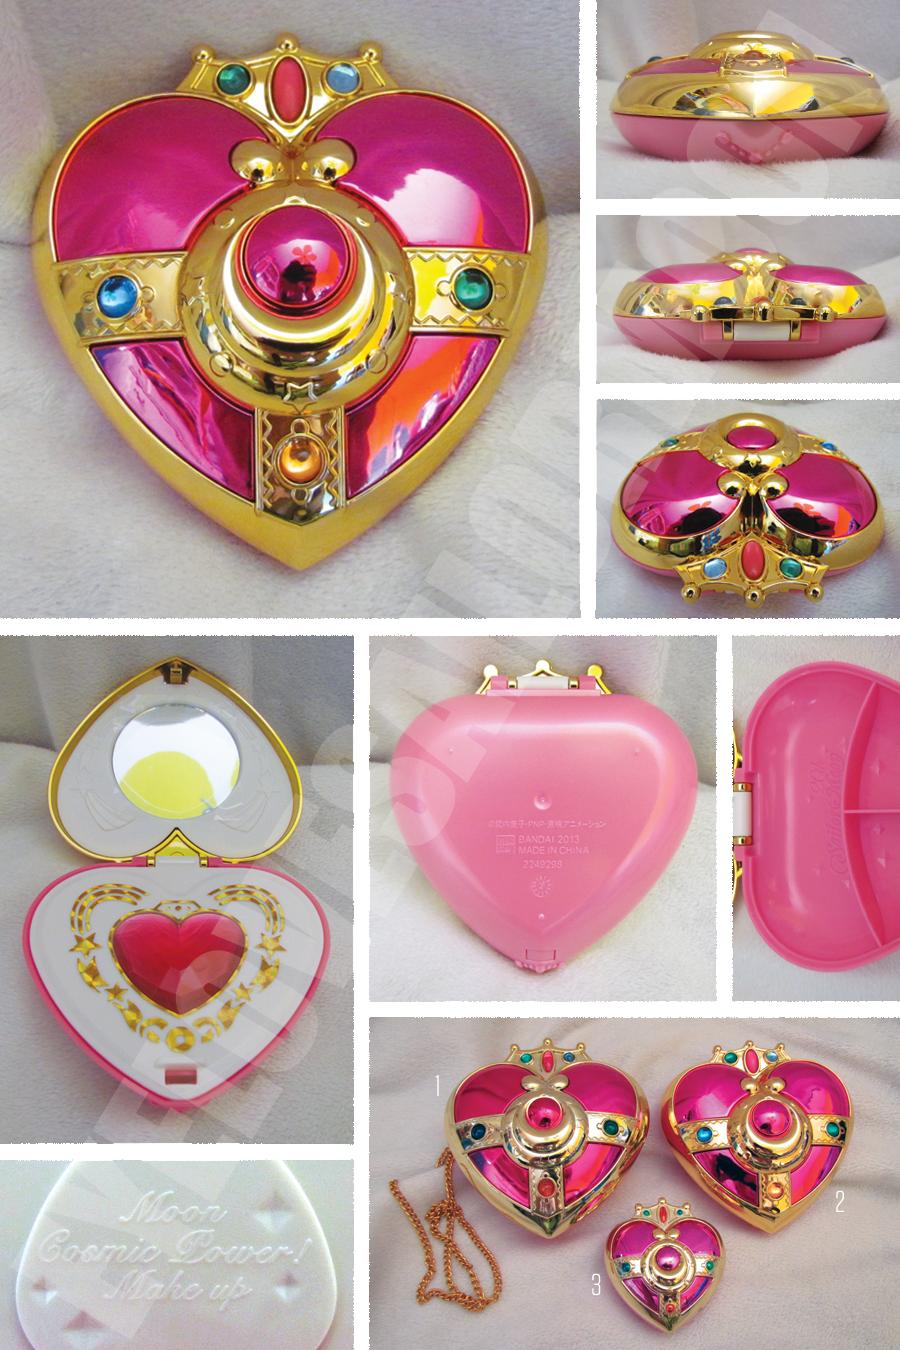 Sailor Moon Makeover Compact Mirror Item arrangement Spiral heart